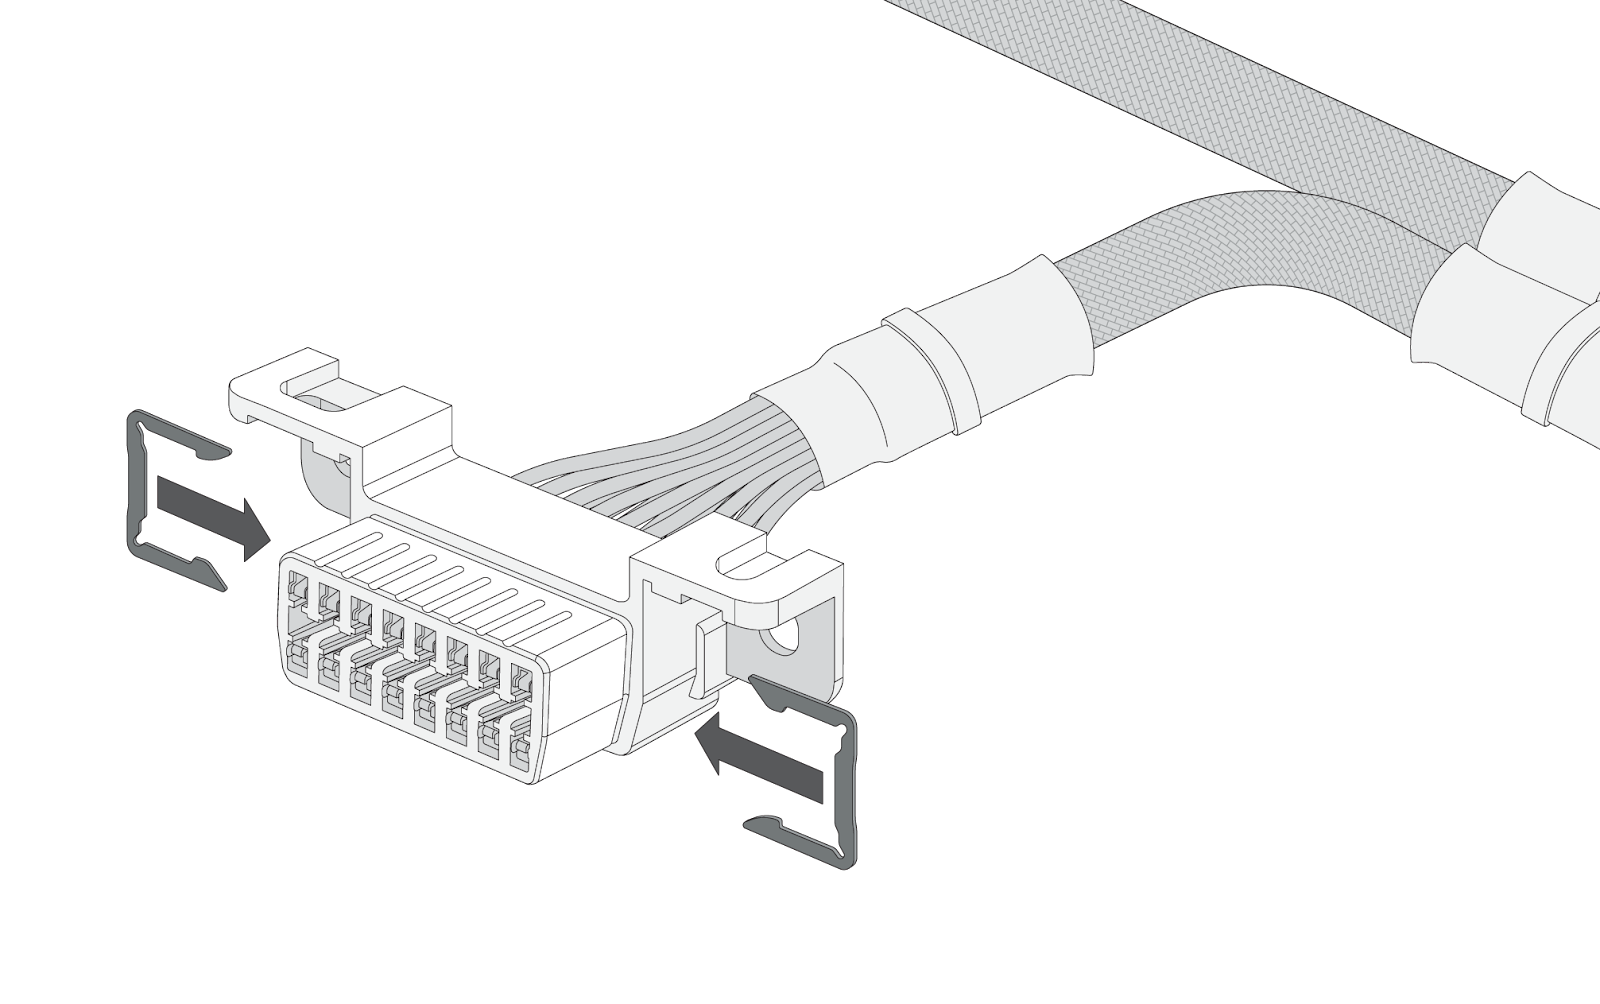 universal-harness-setup-figure6.png